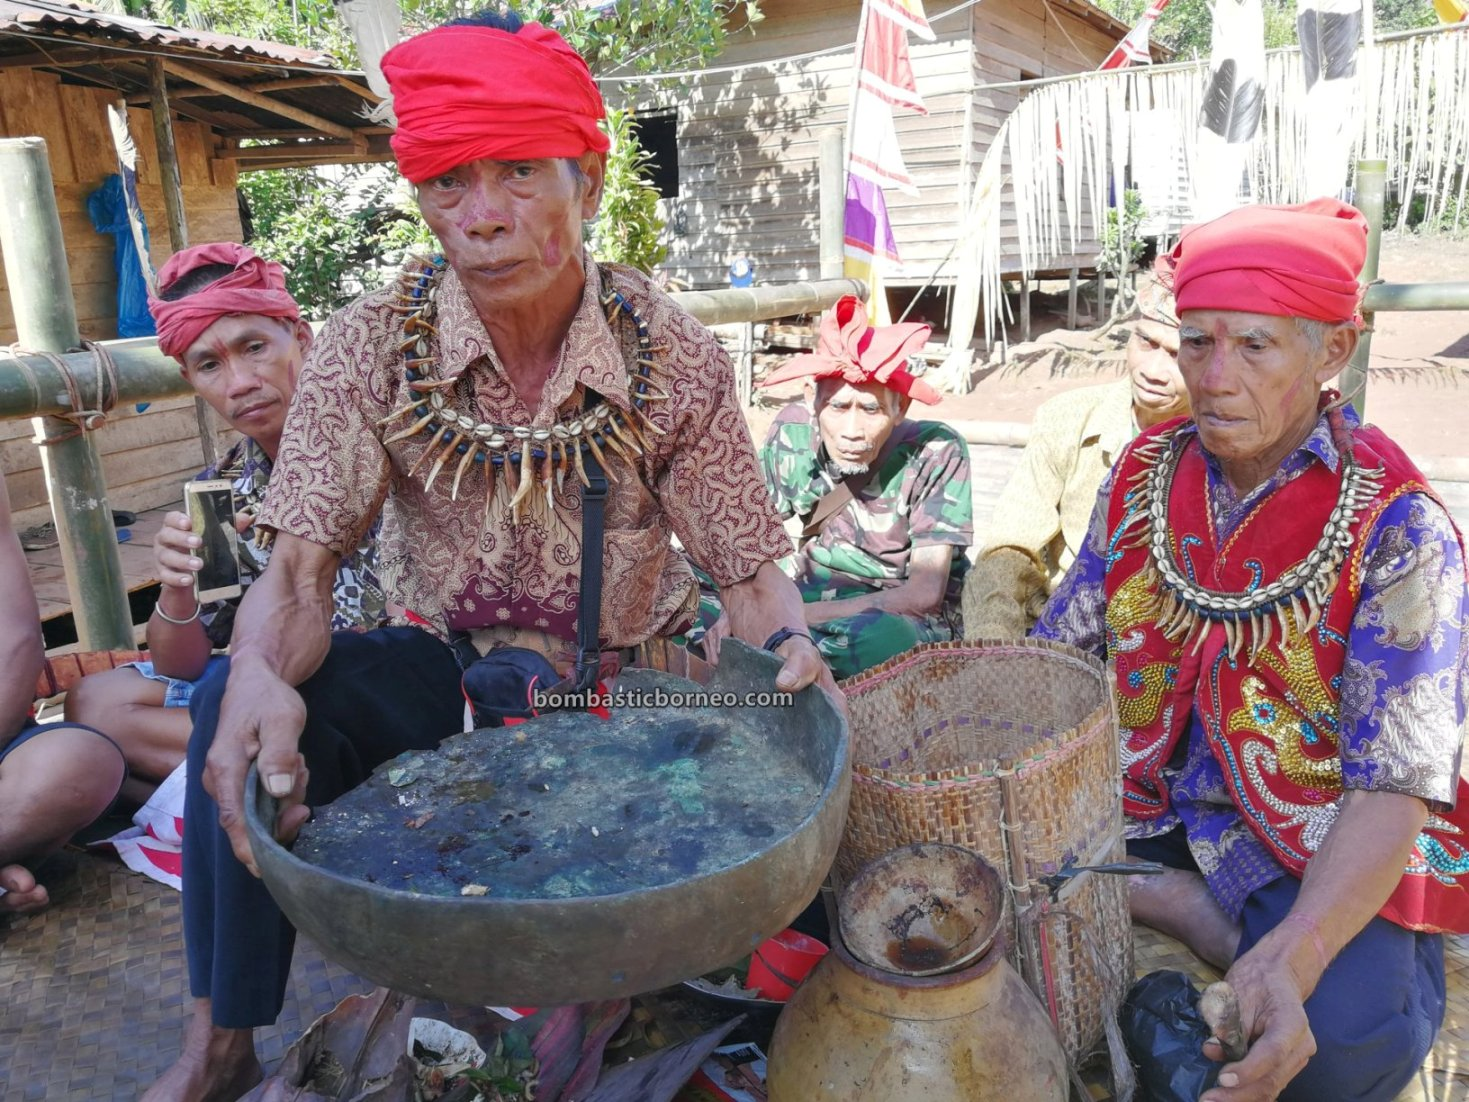 Nyobeng Kambih, Gawai Padi, authentic, event, Indonesia, Bengkayang, Ethnic, native, village, Tourism, tourist attraction, Travel guide, Trans Border, Borneo, 印尼西加里曼丹, 原住民丰收节日,